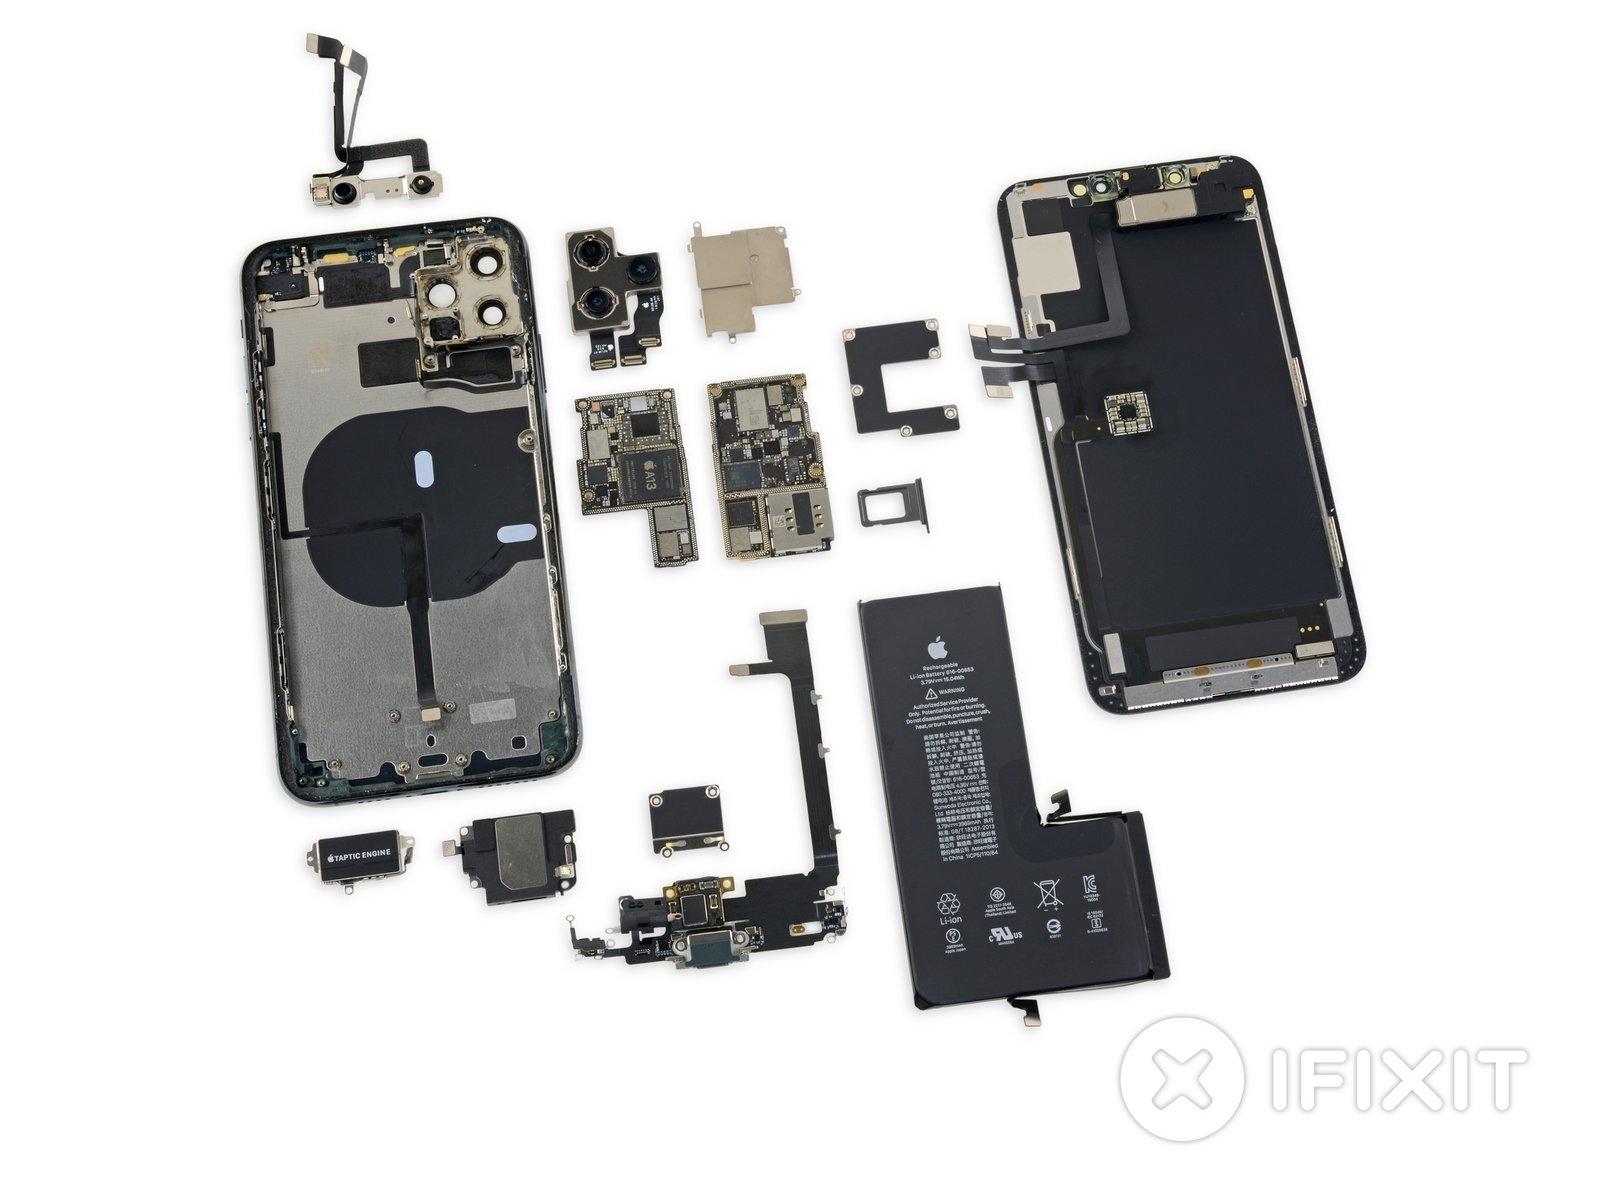 Iphone 11 Pro Teardown Spekulationen Uber Bidirektionales